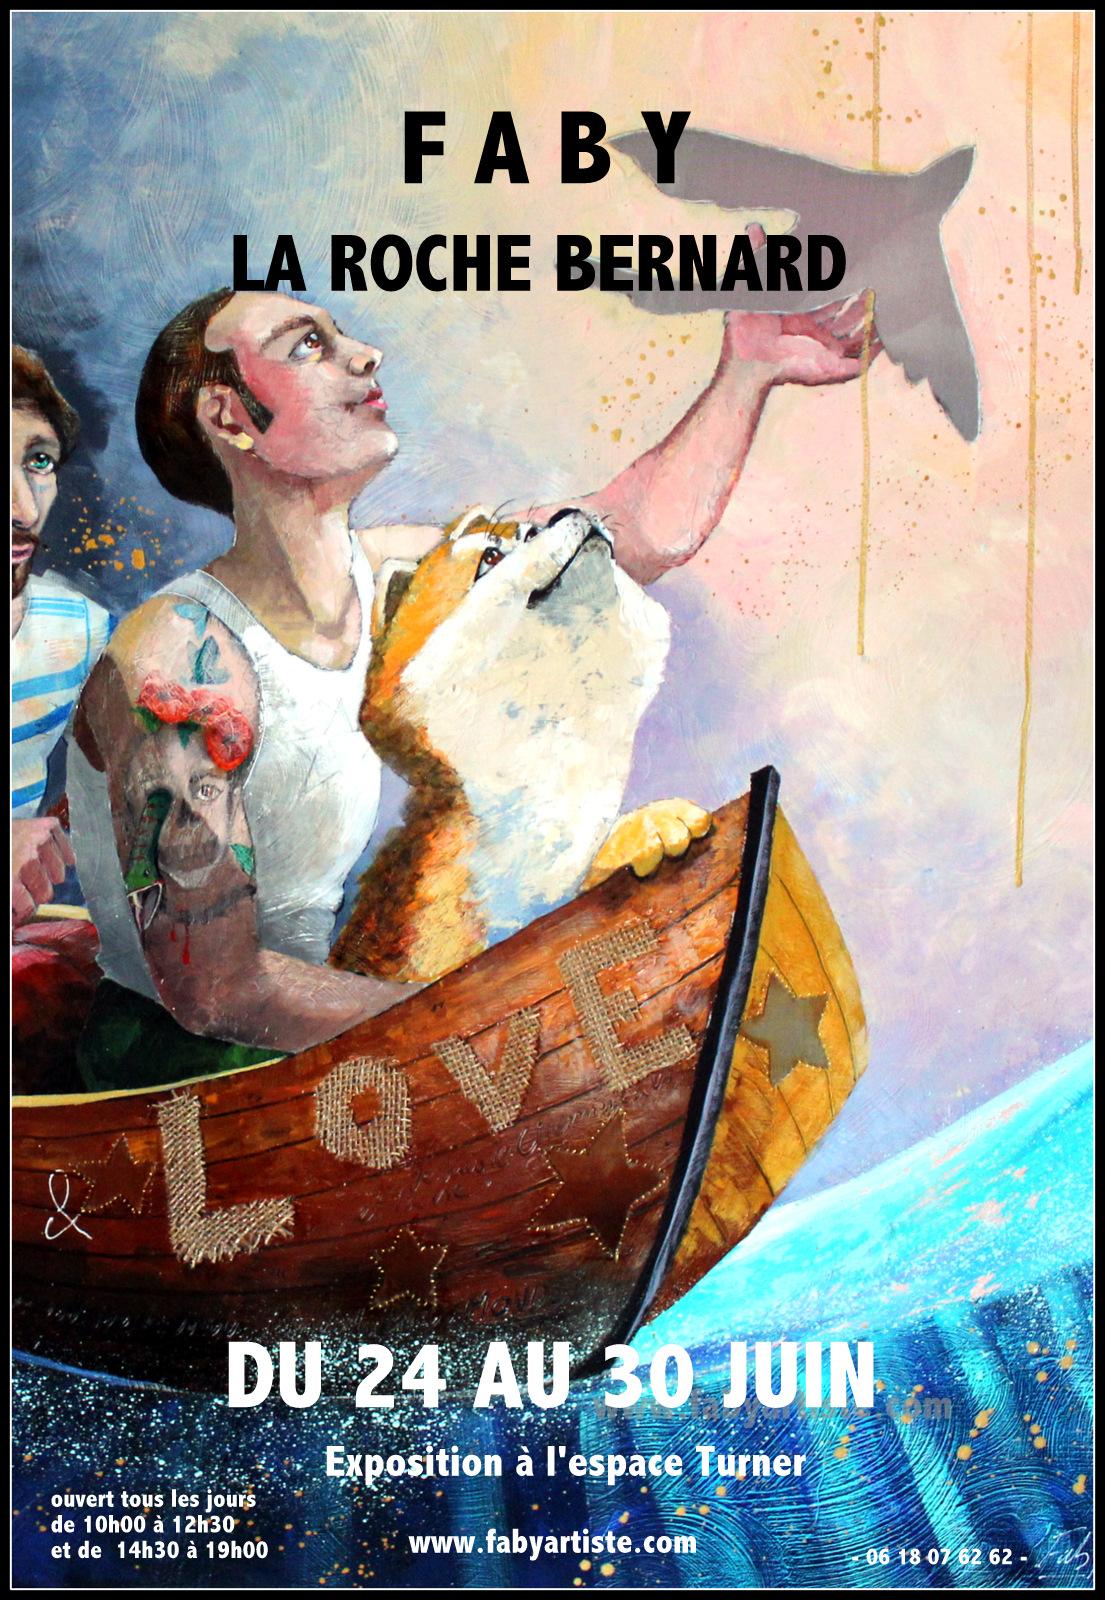 Du 24 au 30 Juin La Roche Bernard